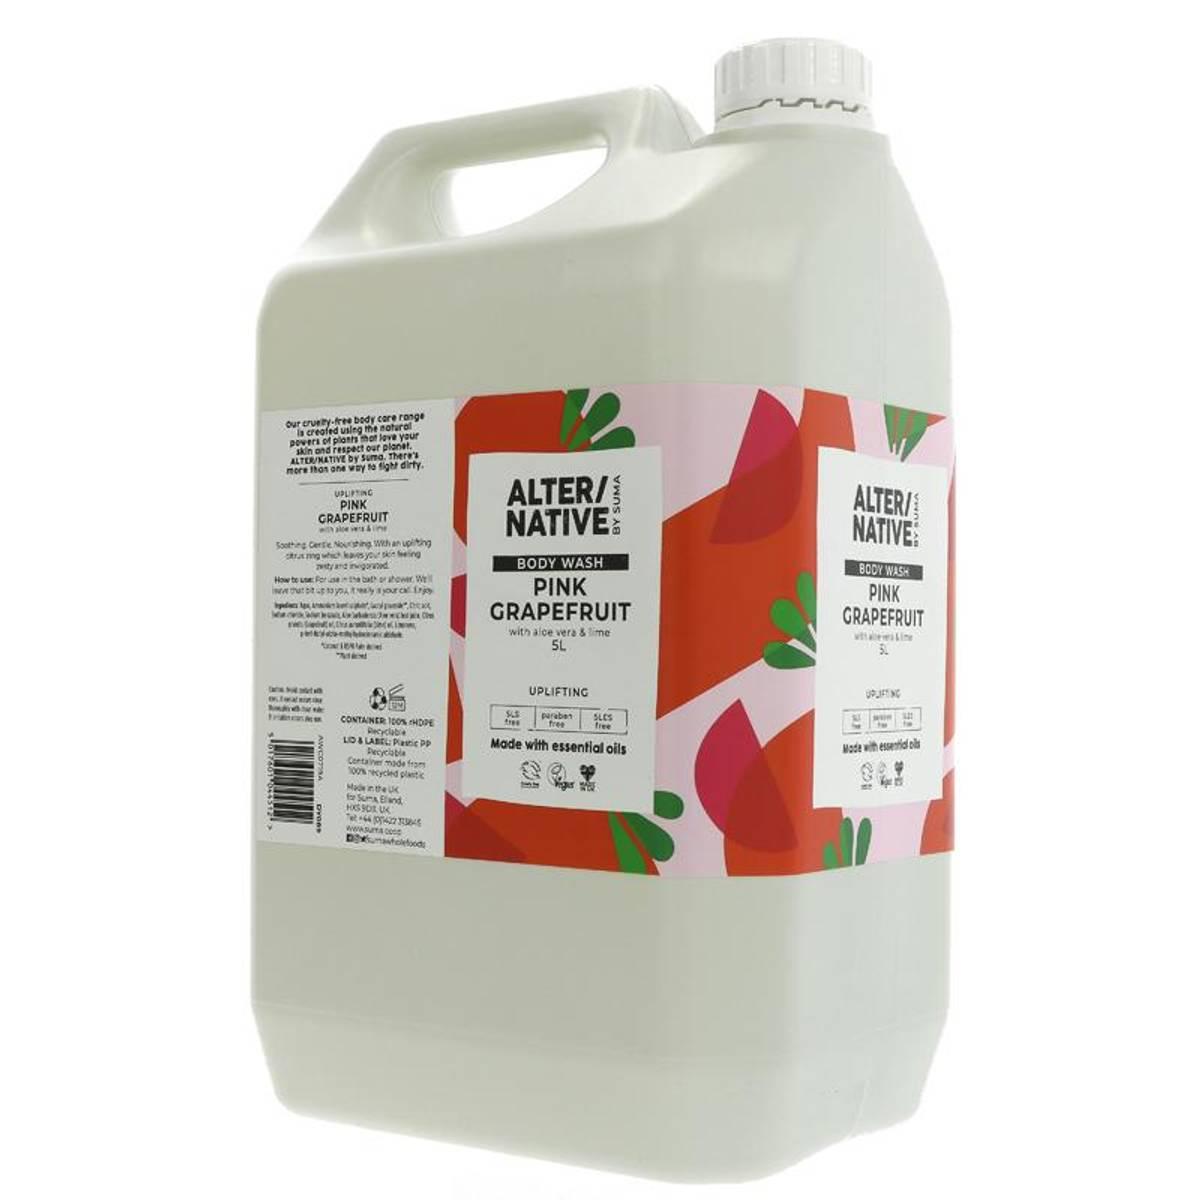 5L flytende dusjsåpe Pink Grapefruit Aloe / Alter/native